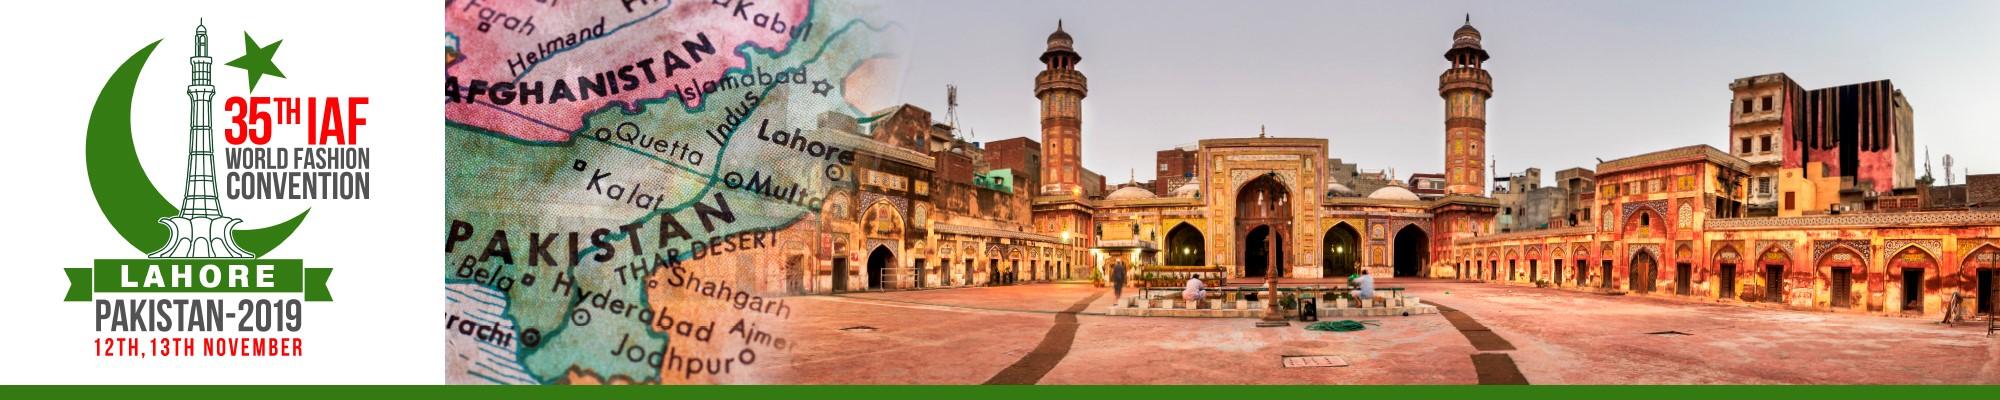 2019 Lahore - IAF 35th IAF World Fashion Convention Lahore